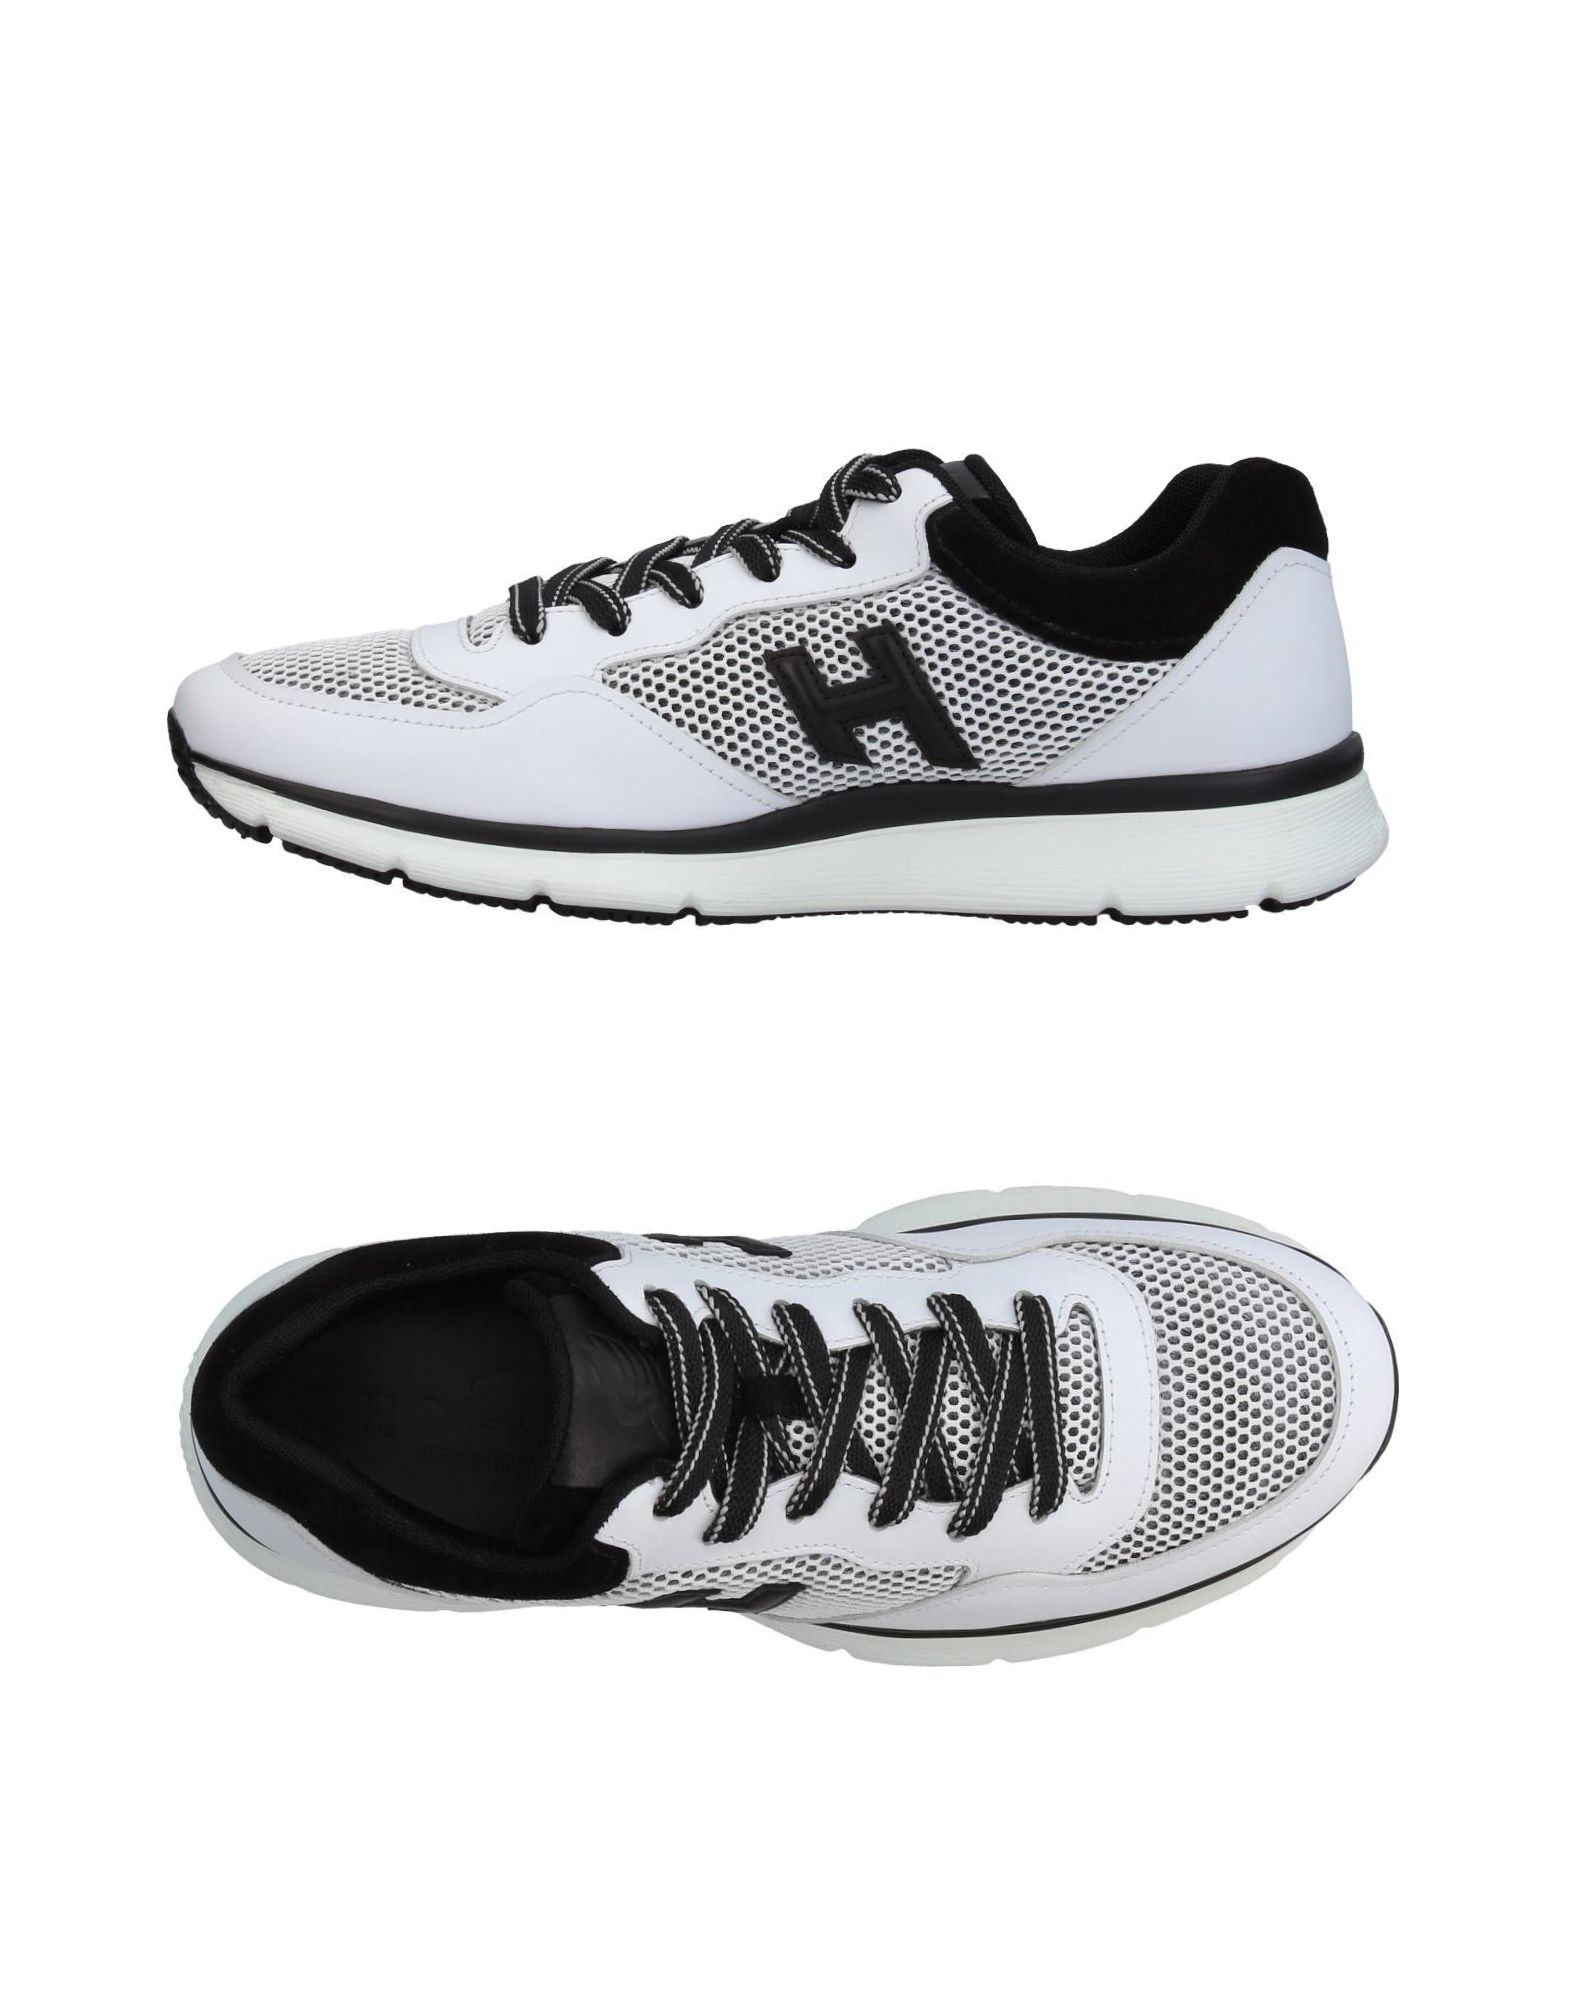 Hogan Sneakers Herren  11398552RL Gute Qualität beliebte Schuhe